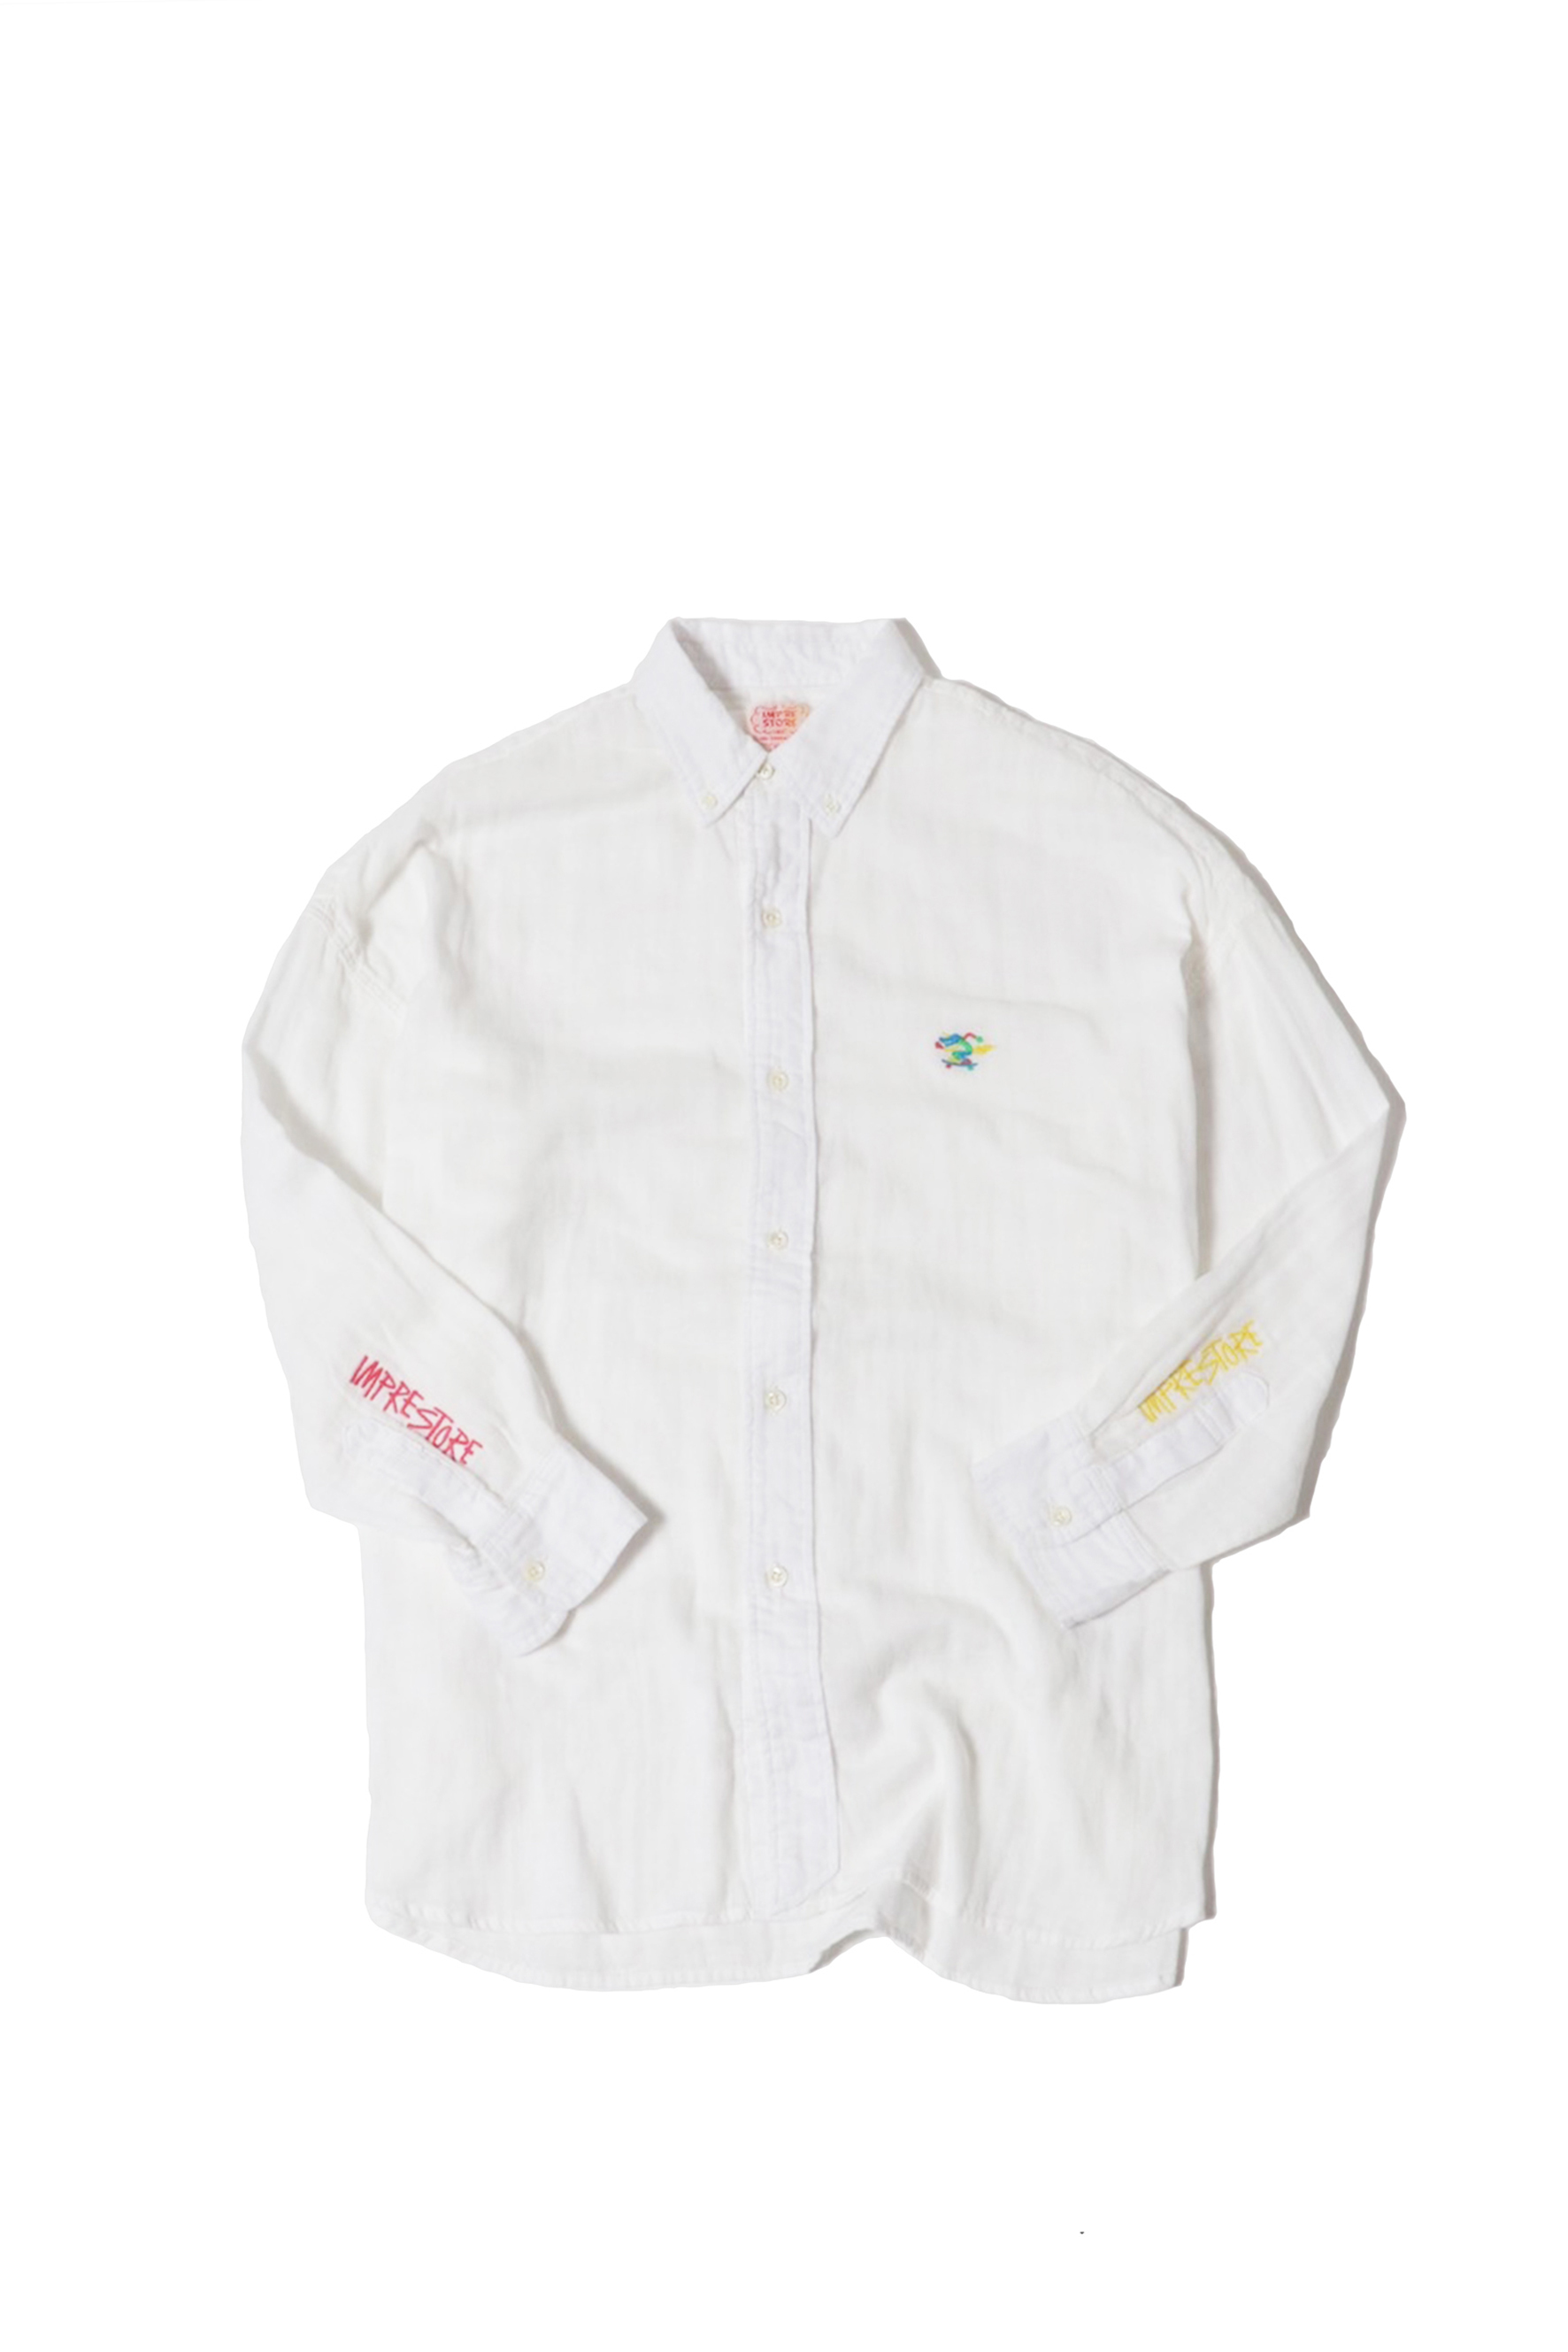 Doublegauze buttondown shirt